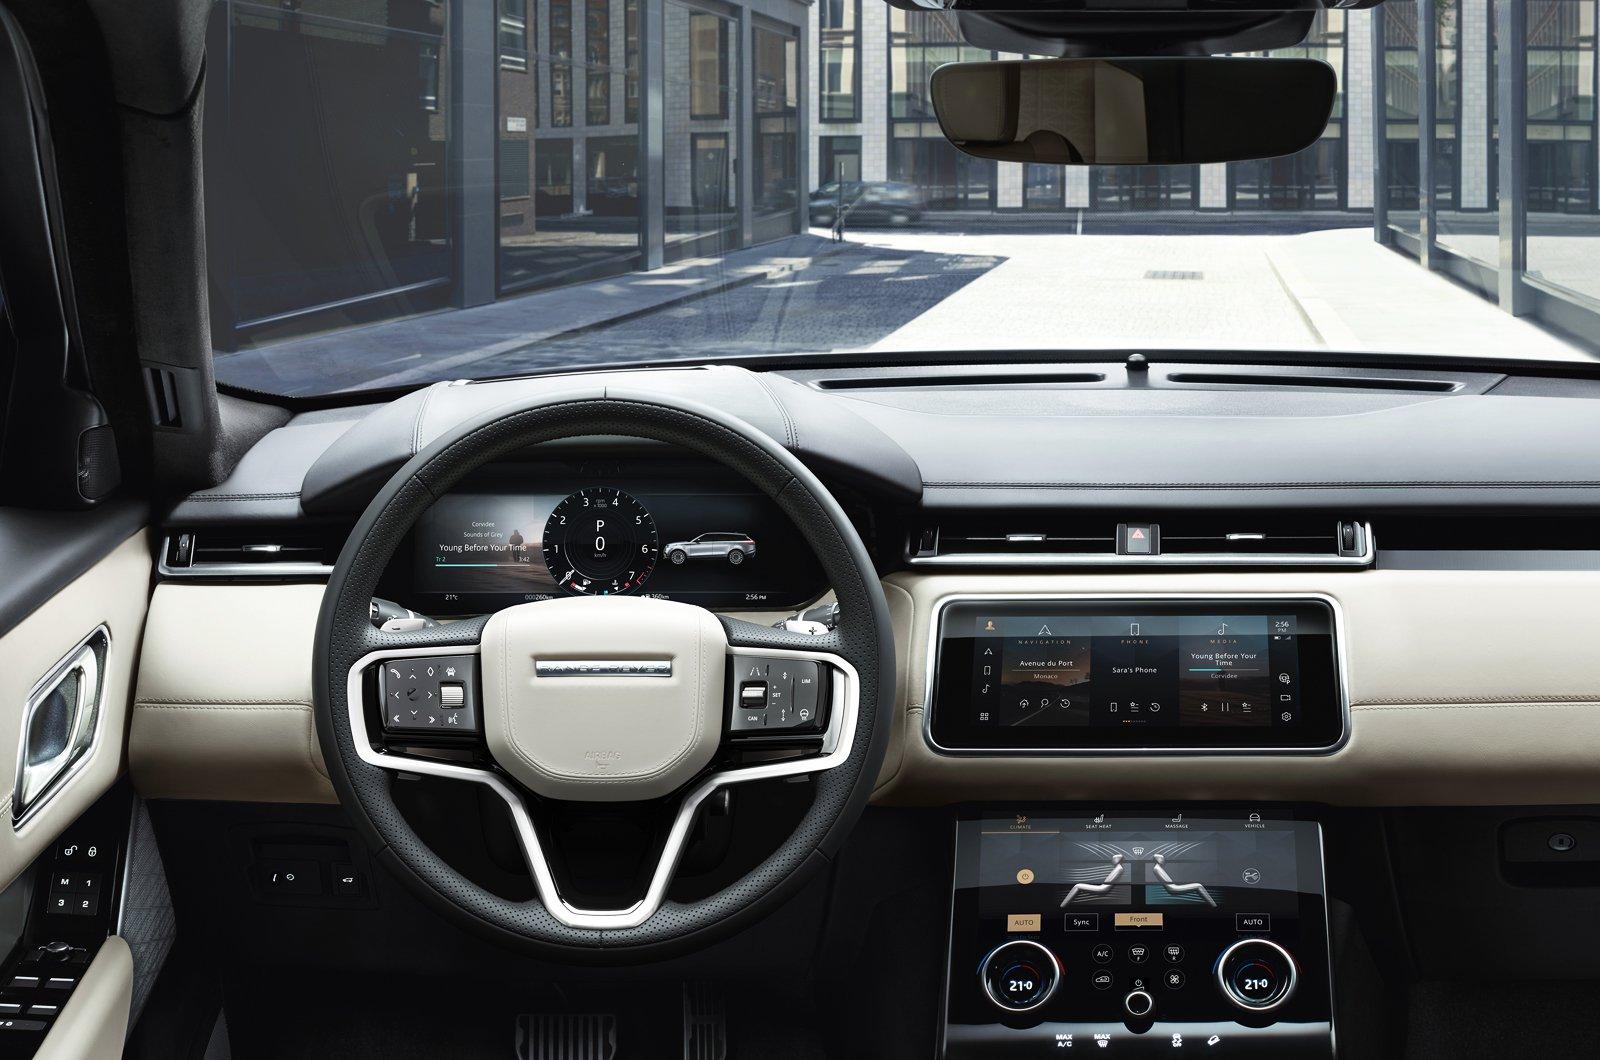 2021 Range Rover Velar dashboard